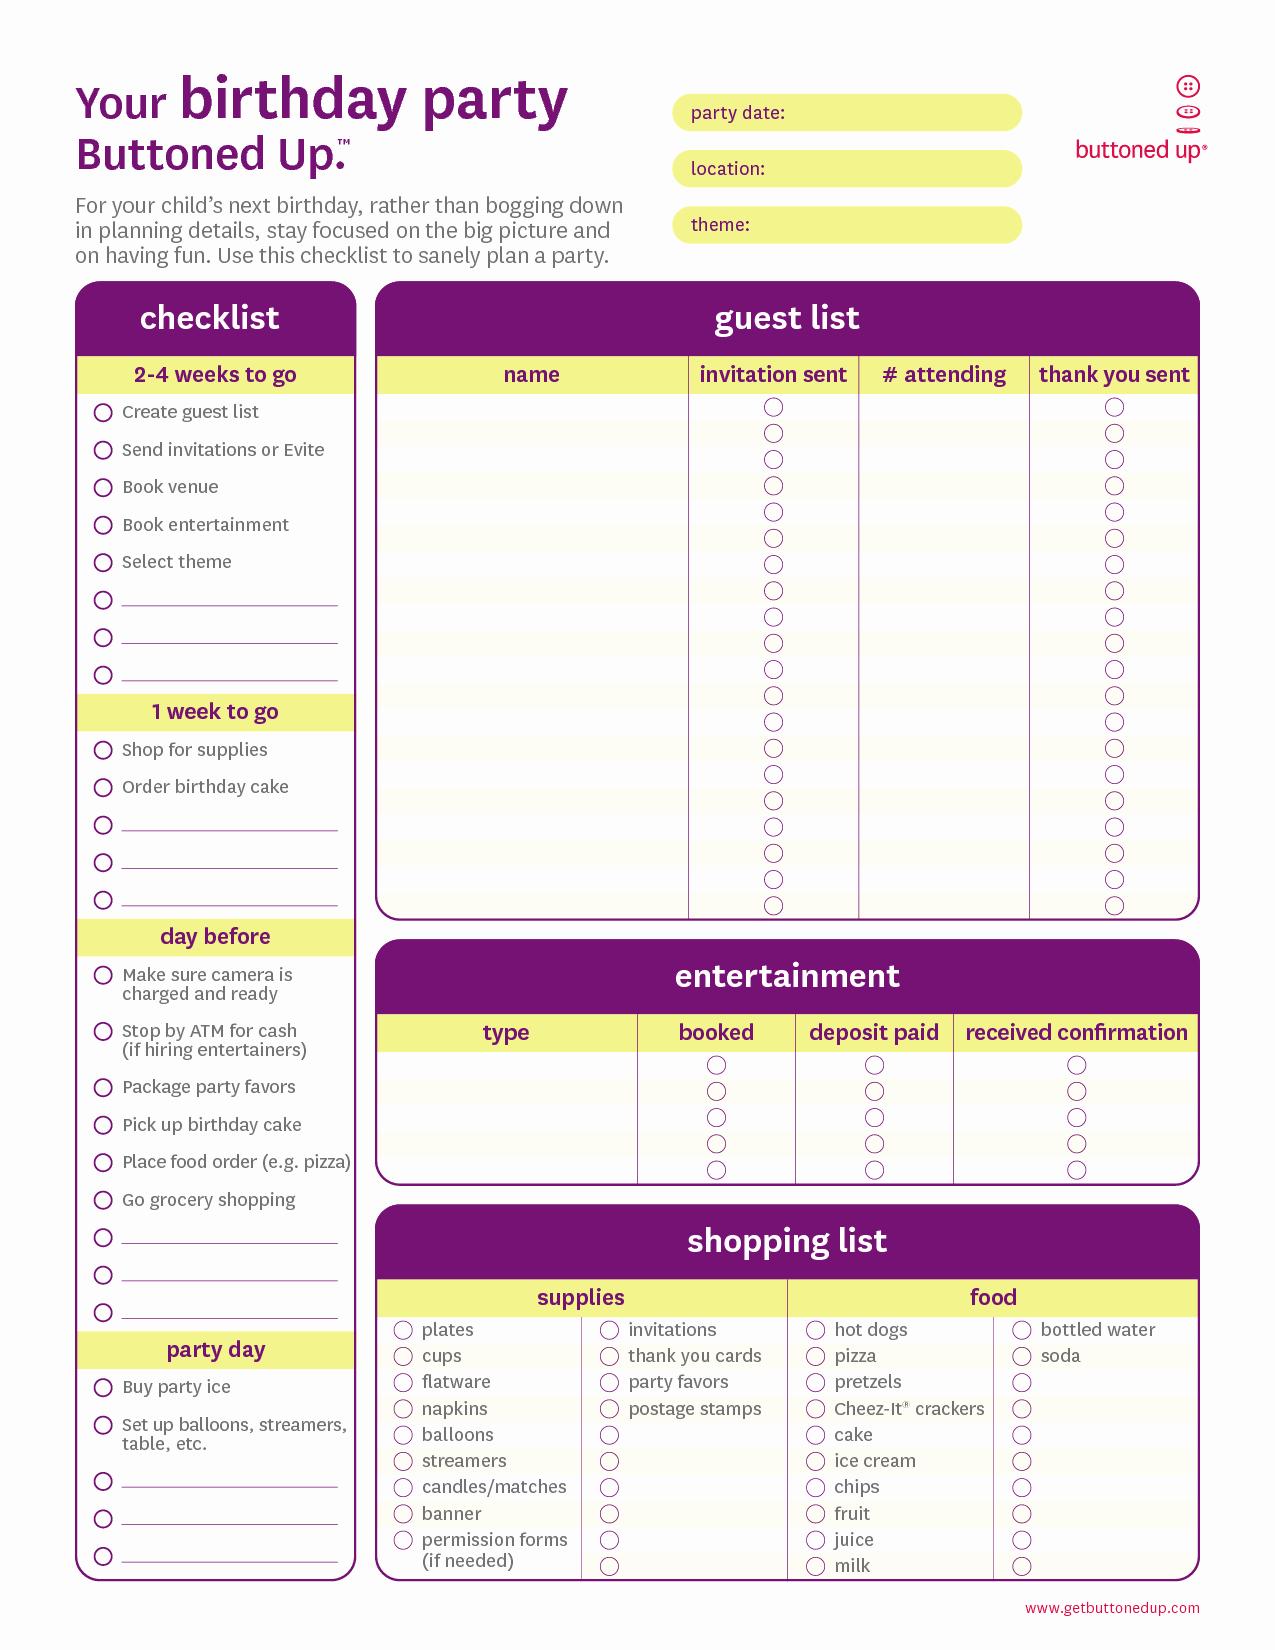 Cake order forms Templates New Free Printable Cake order forms Pdf Cakepins